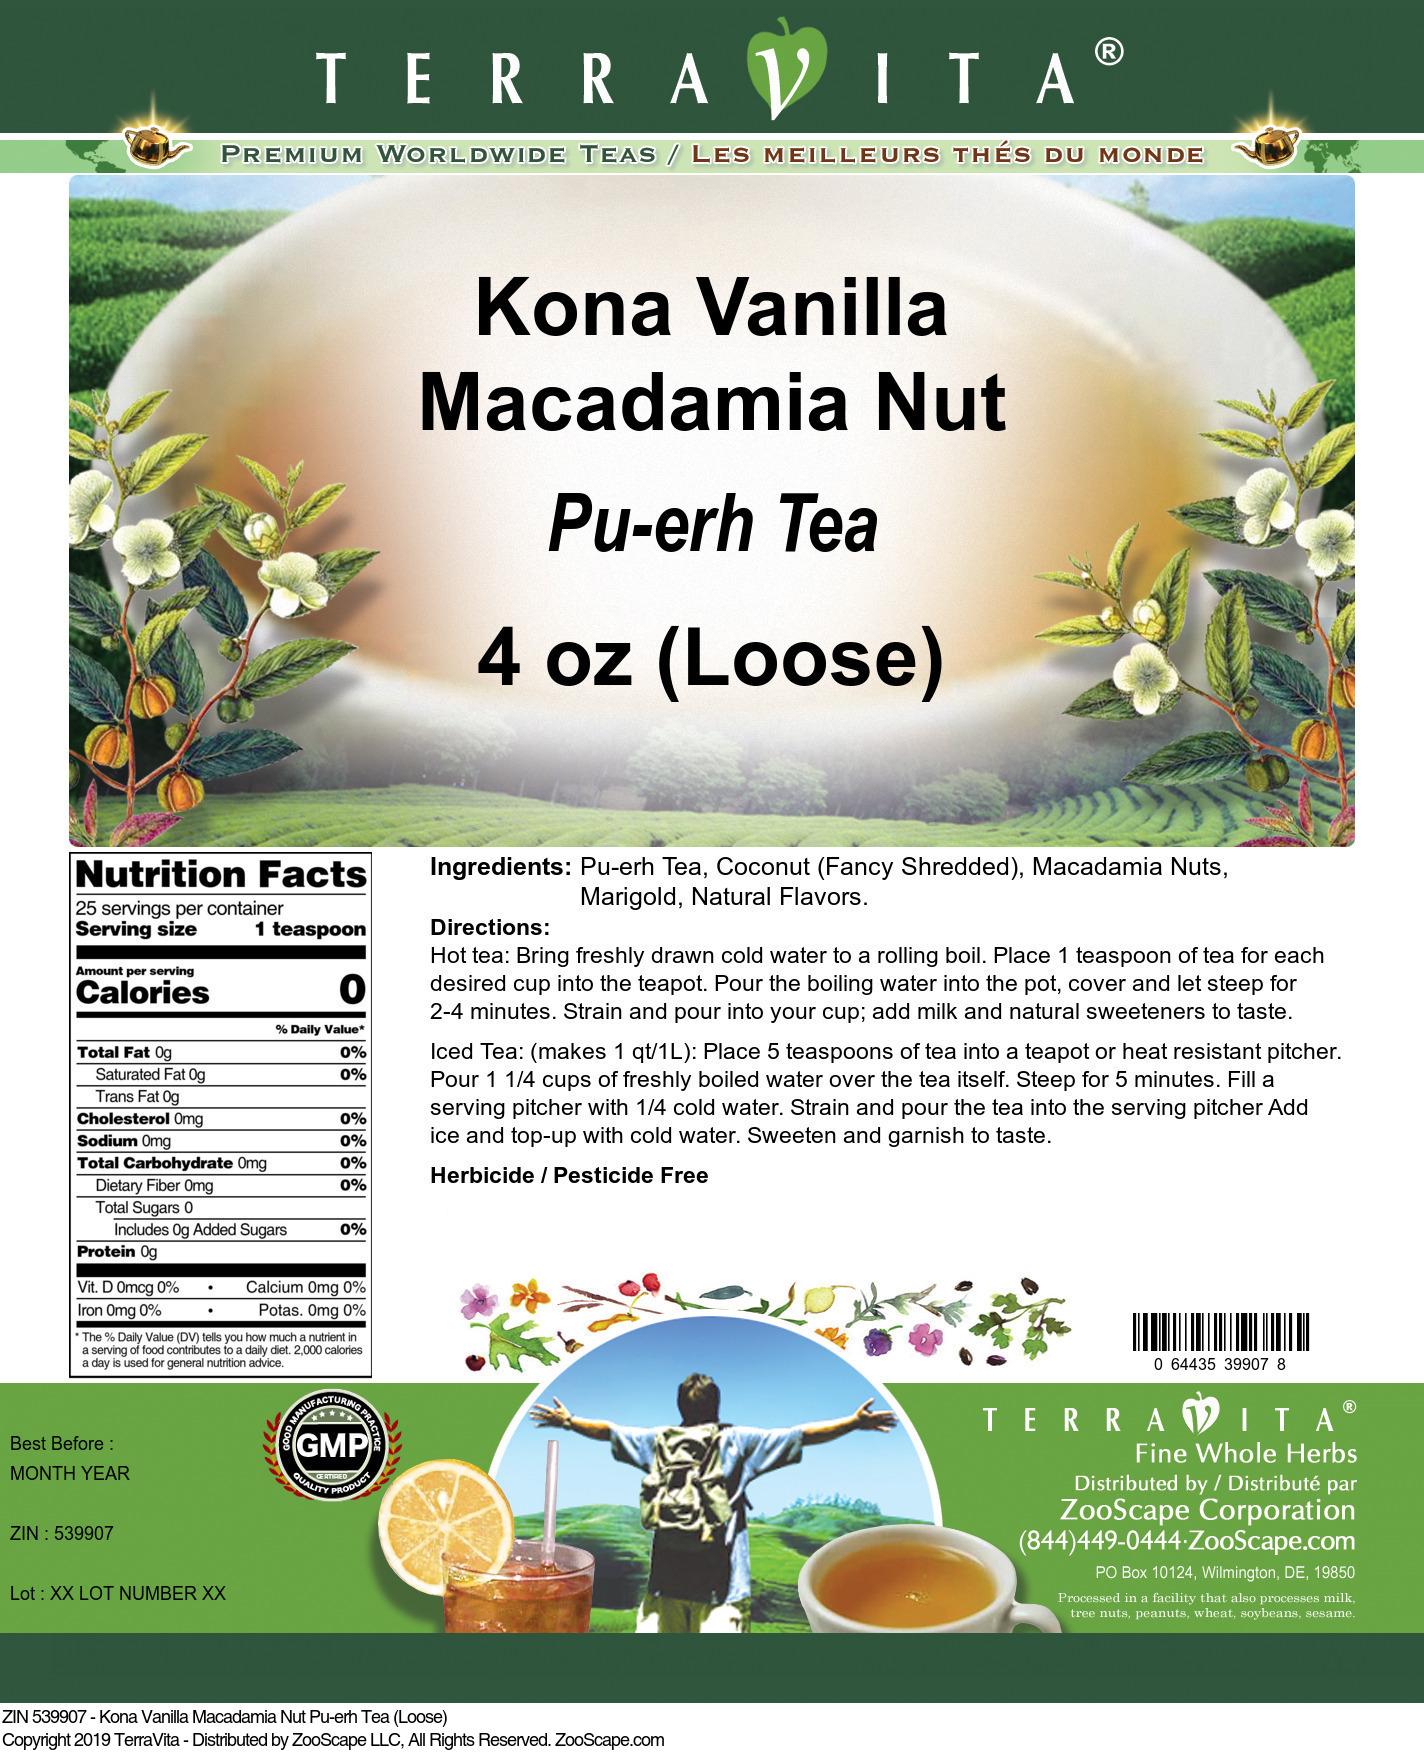 Kona Vanilla Macadamia Nut Pu-erh Tea (Loose)